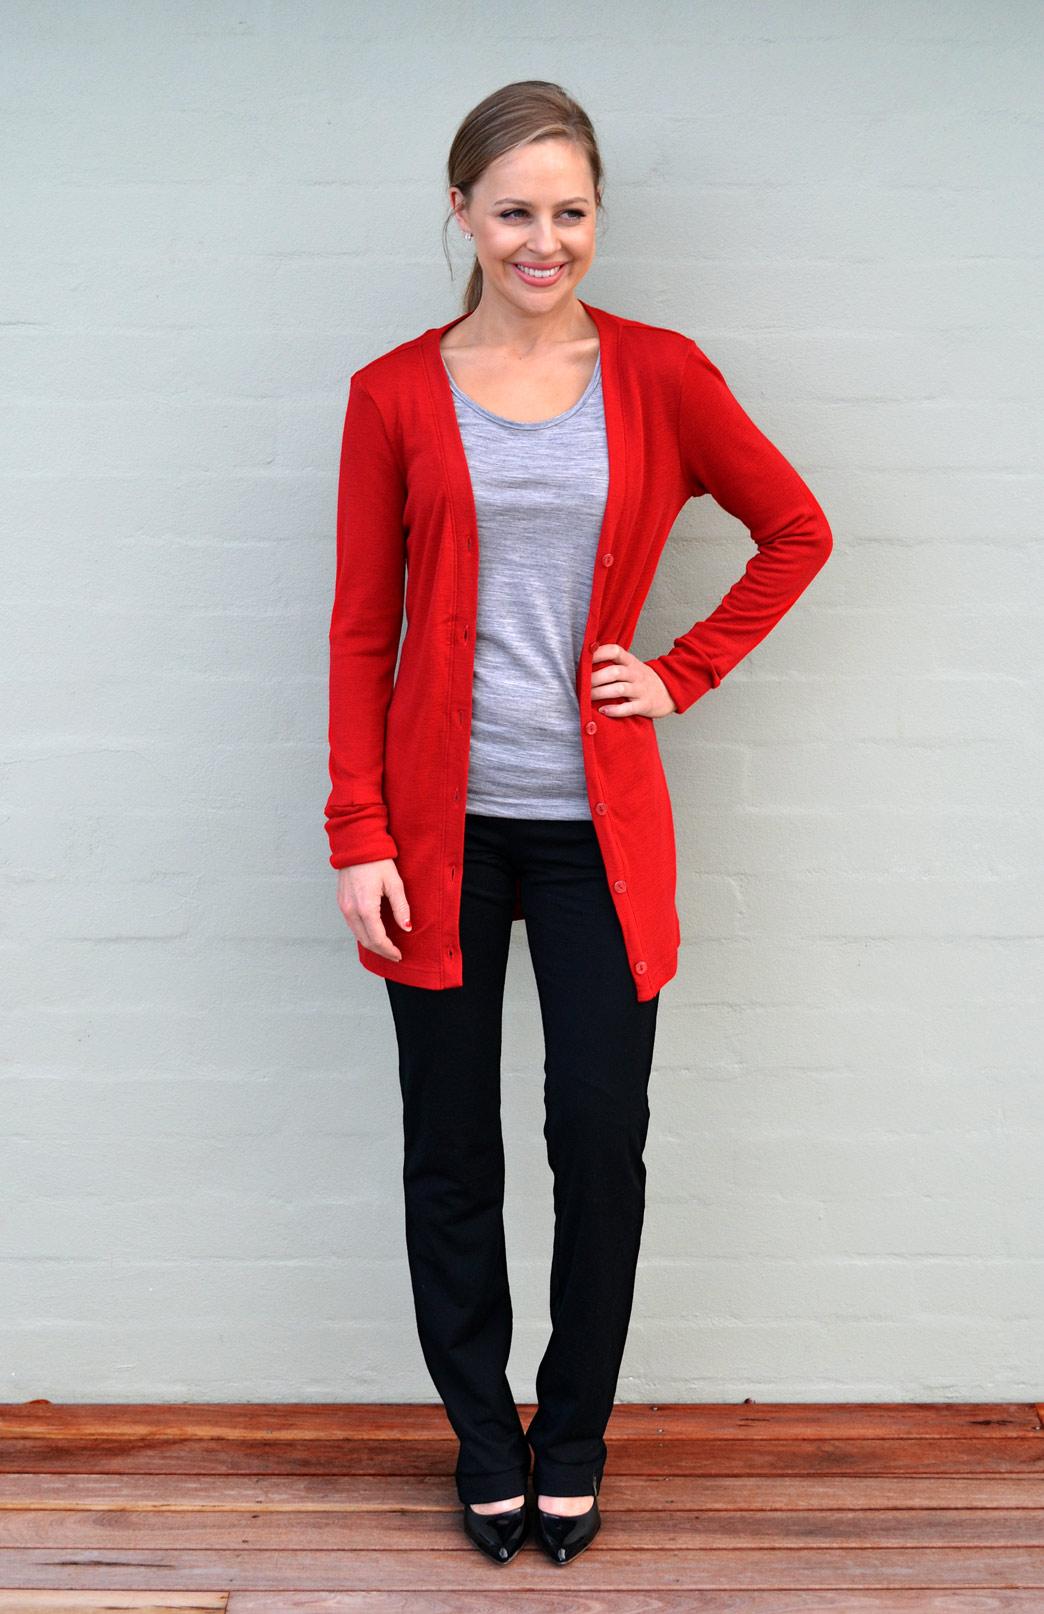 Button Cardigan - Women's Flame Red Wool Cardigan with Buttons - Smitten Merino Tasmania Australia